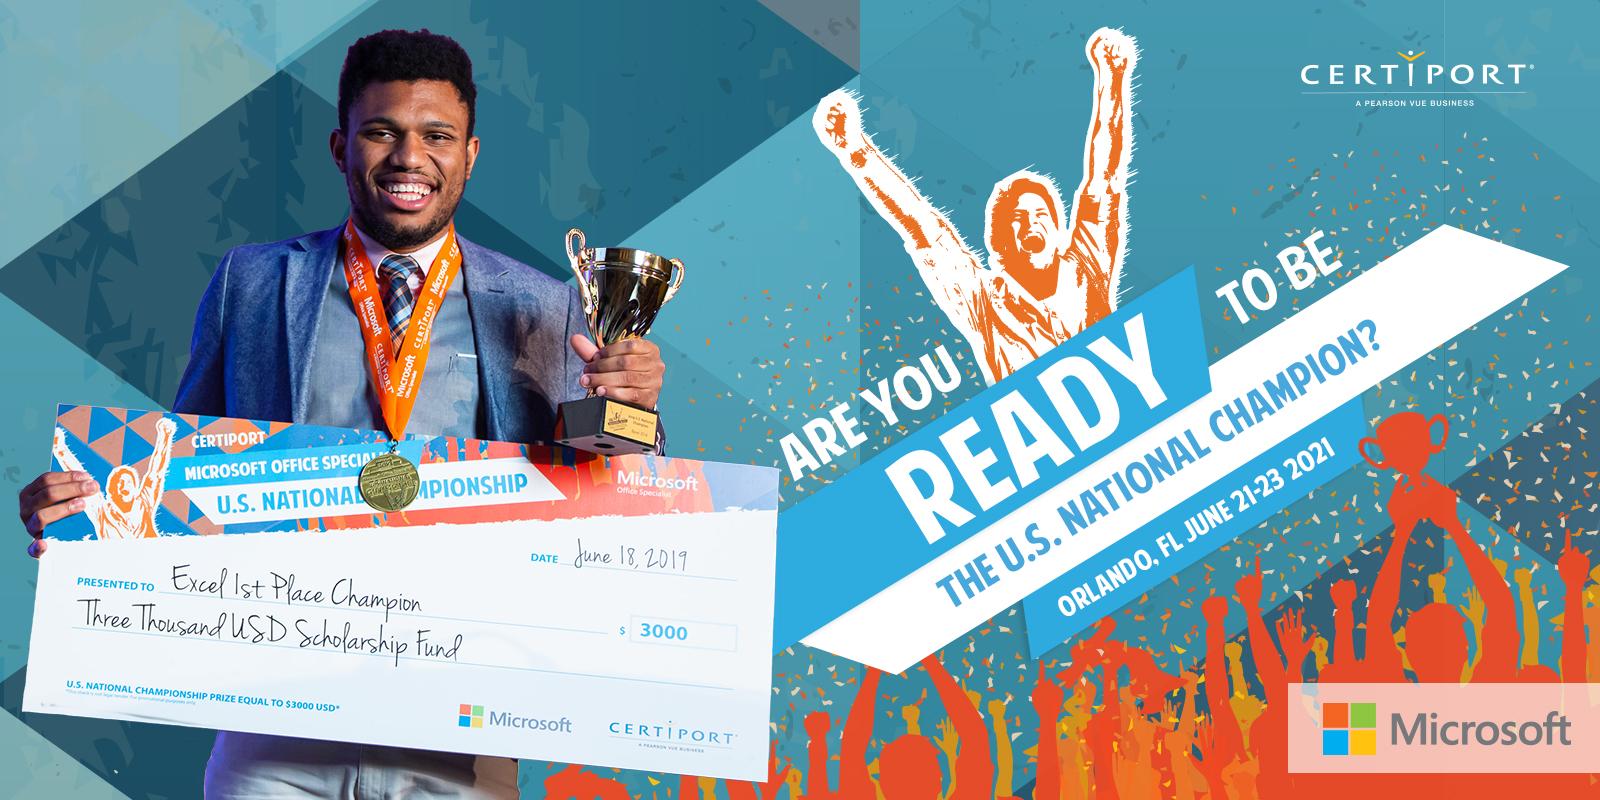 Microsoft Office Specialist U.S. National Championship